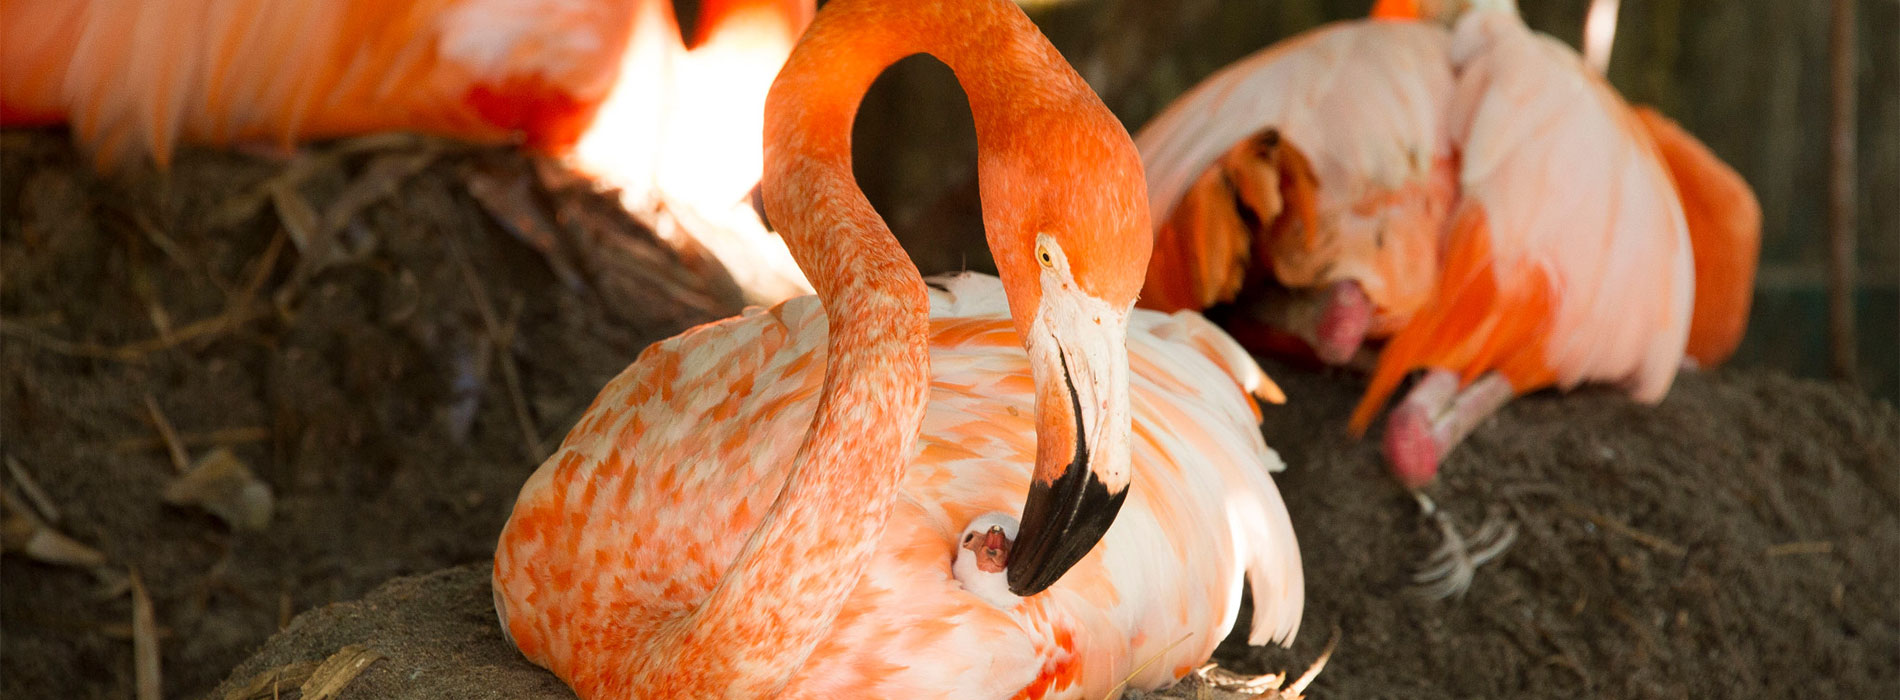 Flamingo nesting